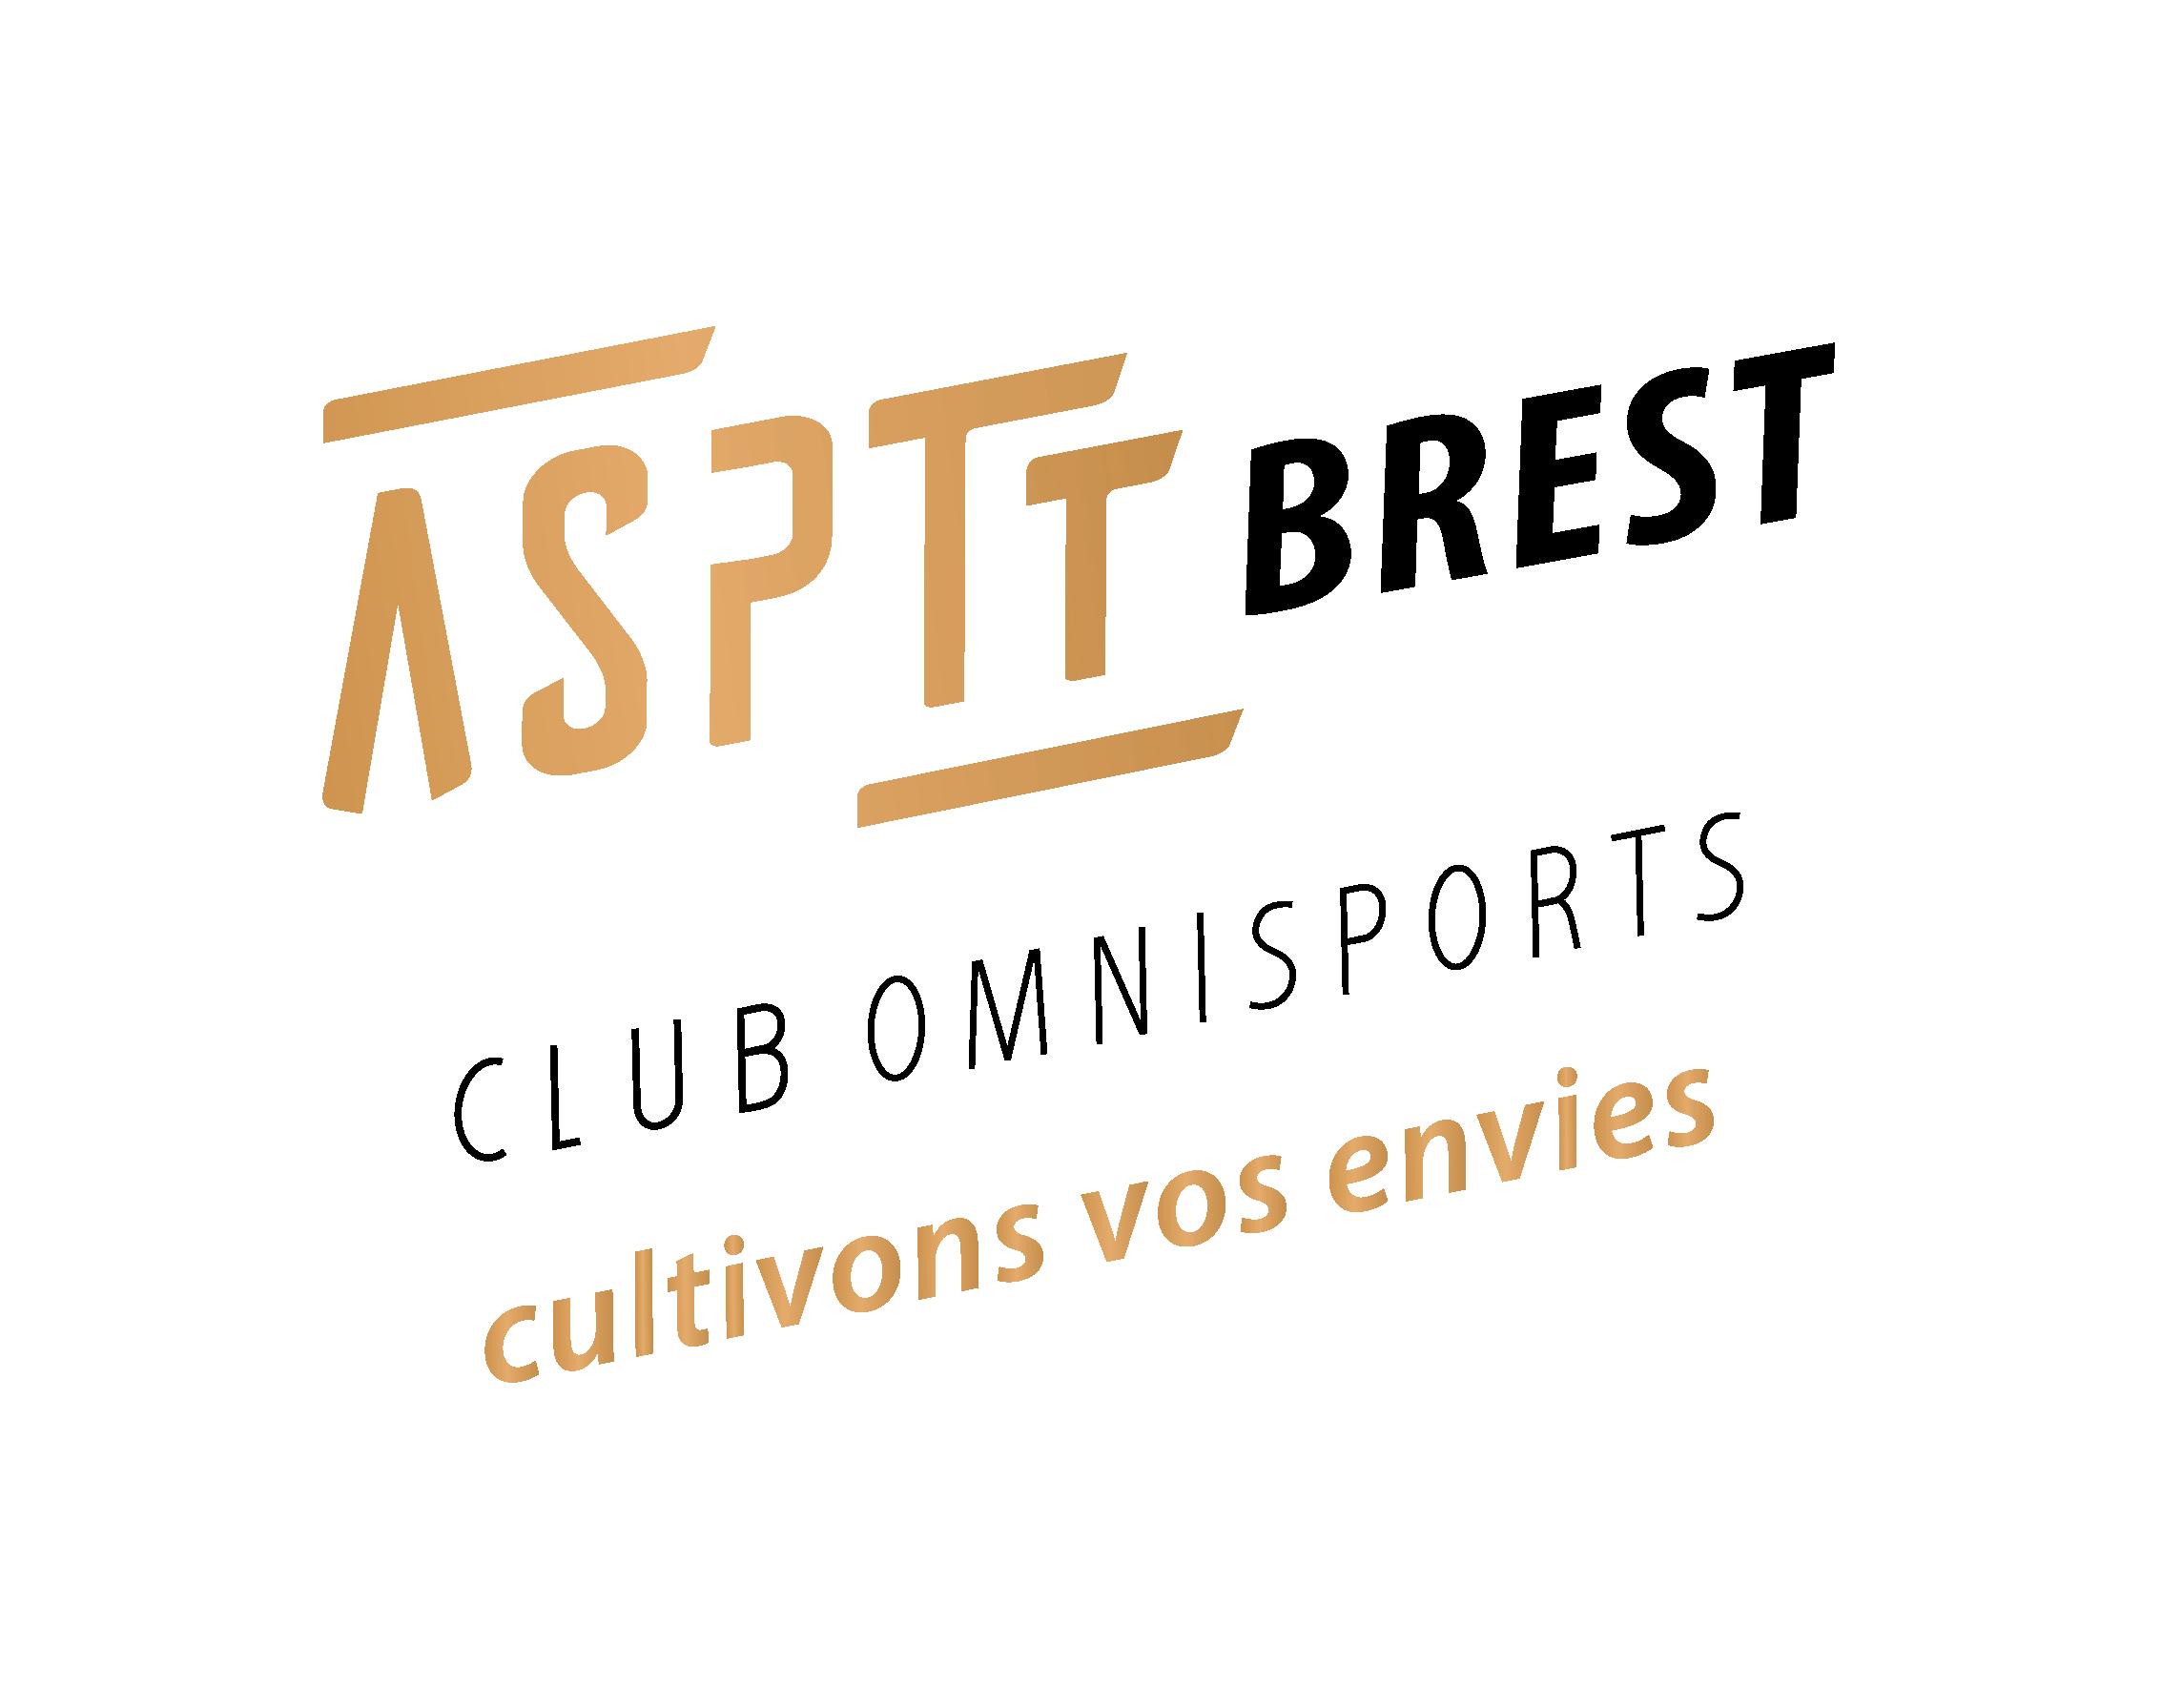 Un club - 25 activités - A l'ASPTT BREST                      Cultivons vos envies